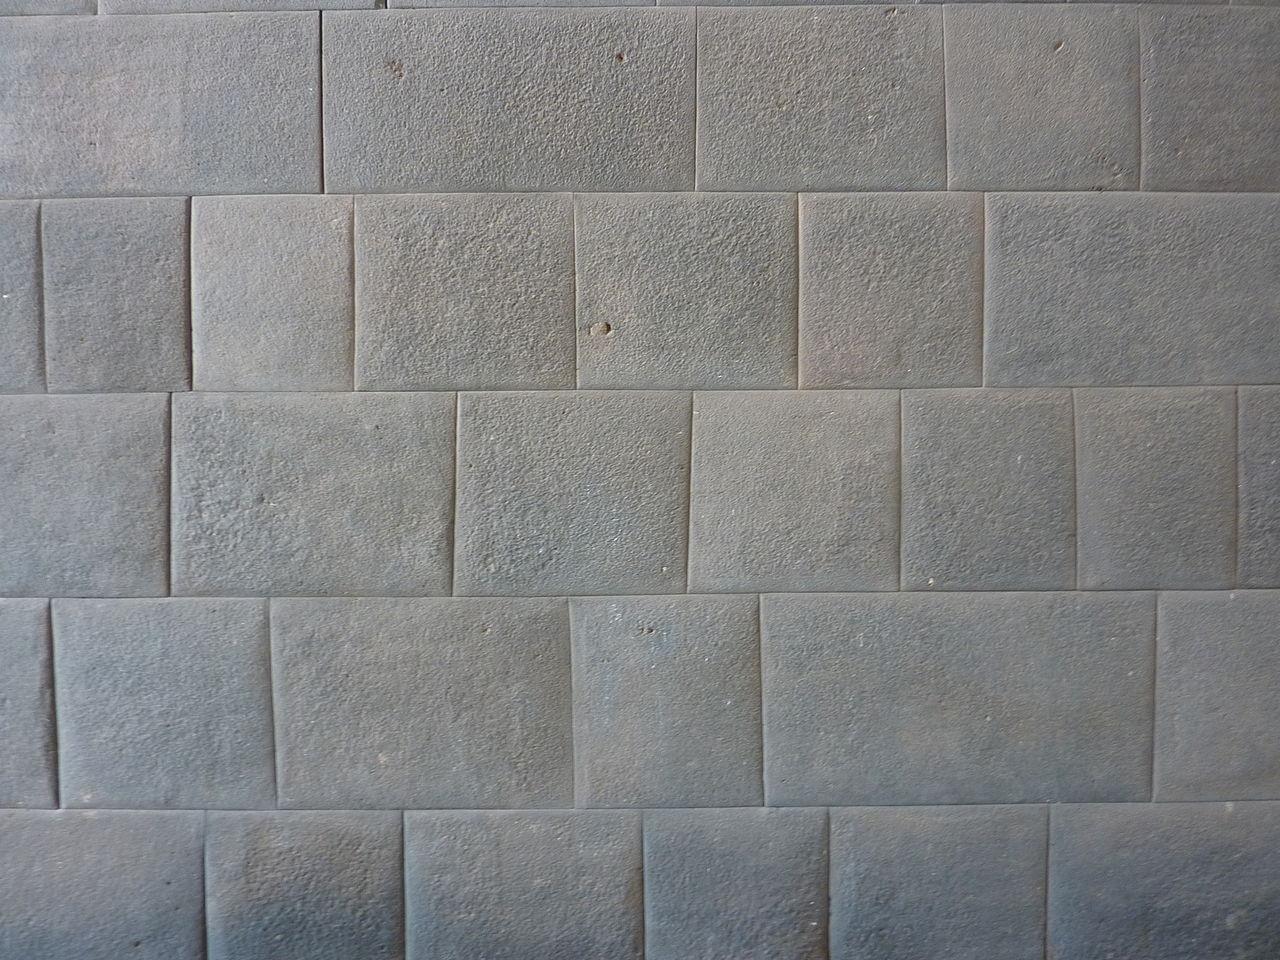 1280px-Inca_wall_2_-_Coricancha_Peru.jpg